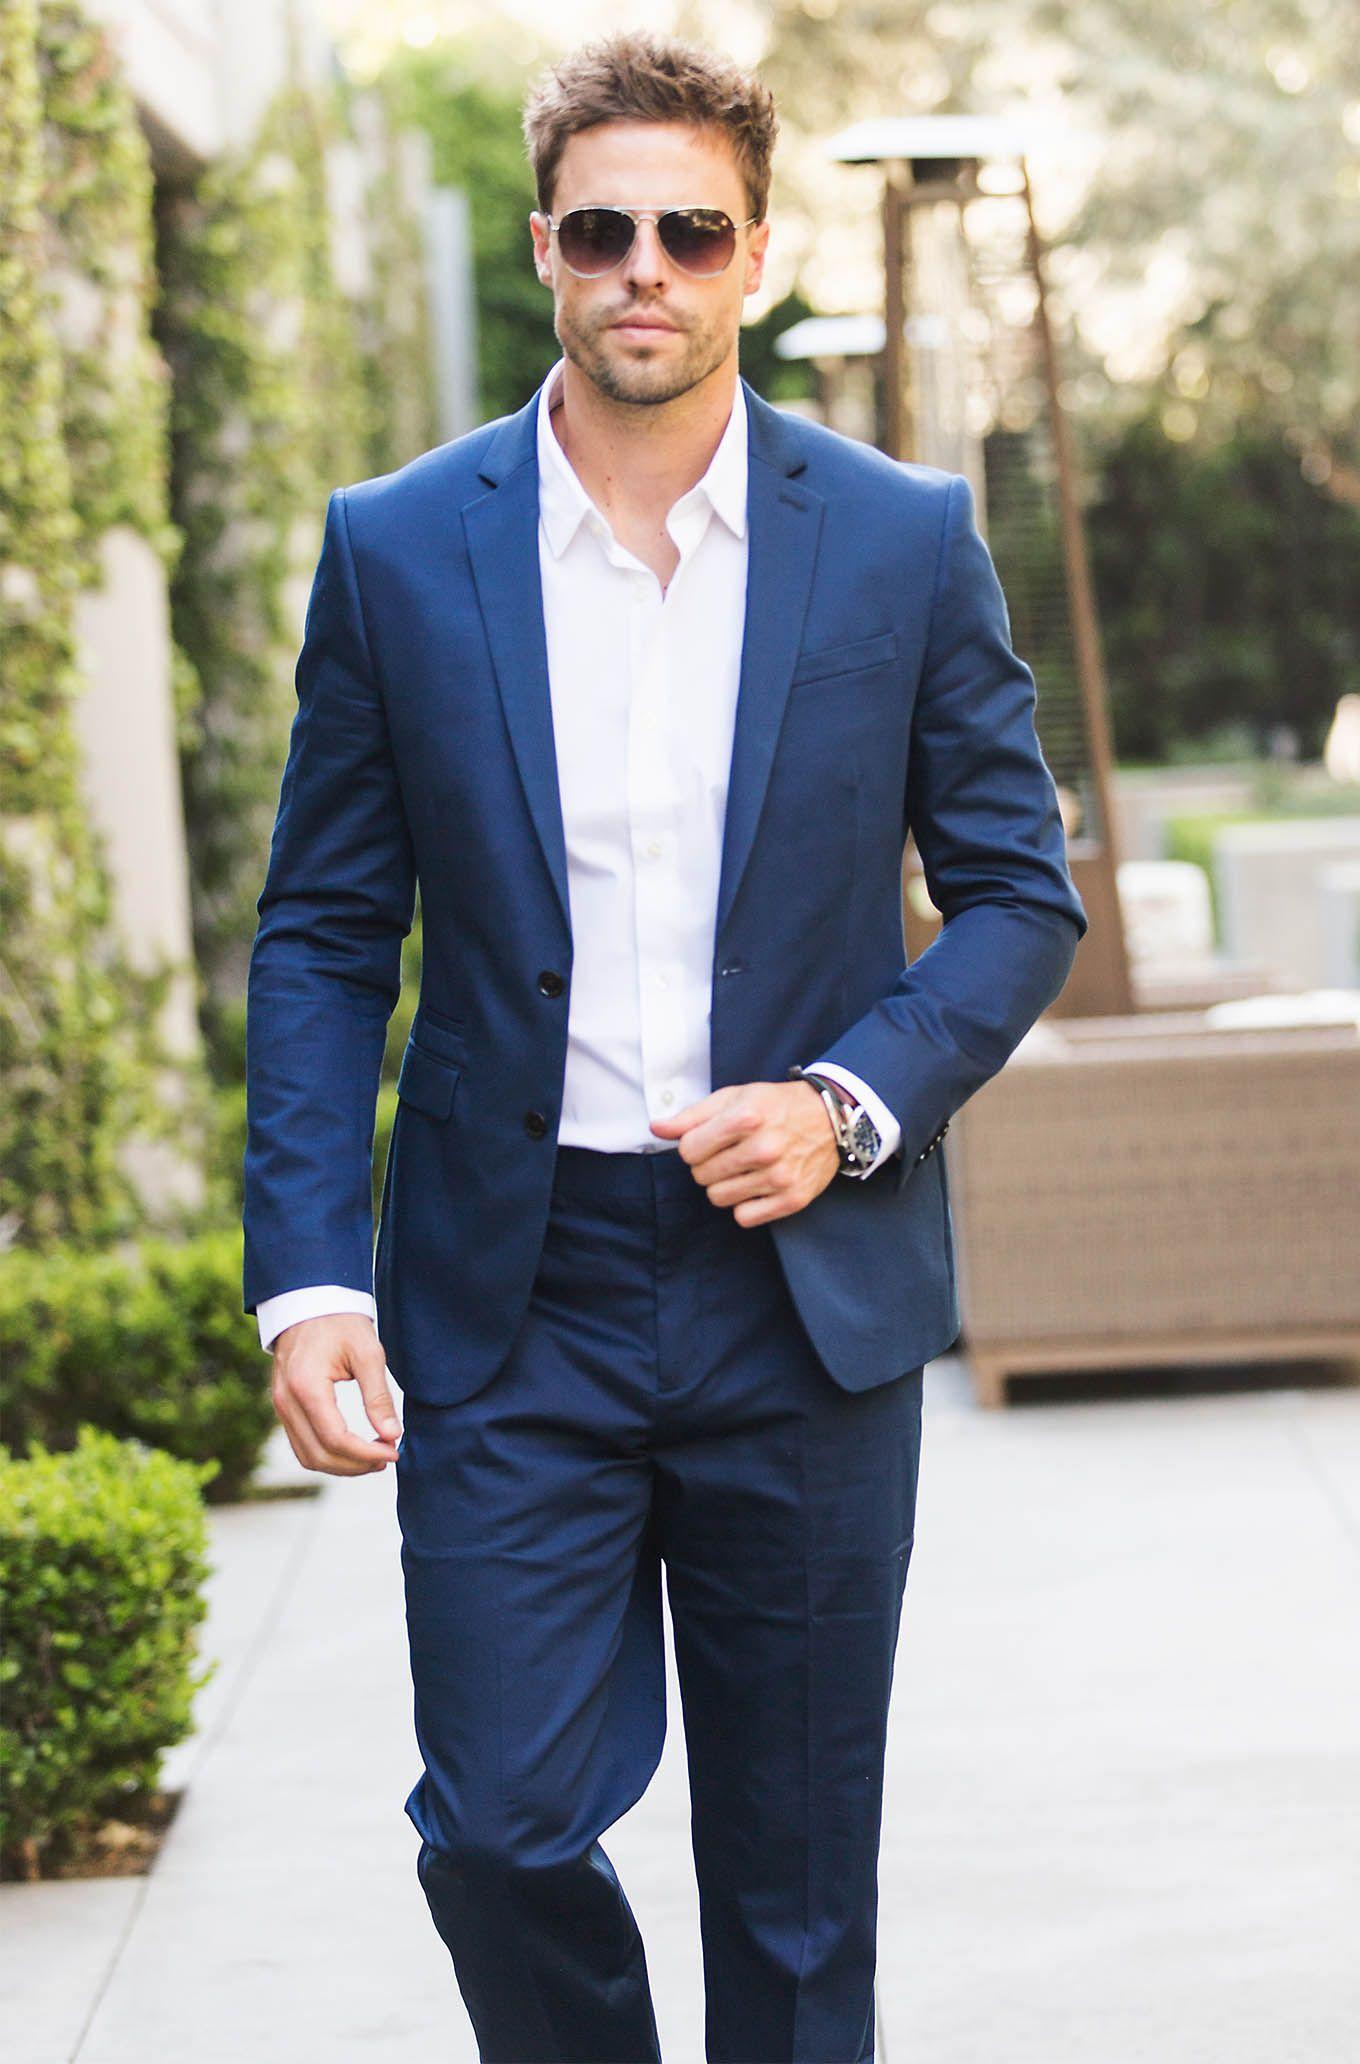 3 Wedding Season Menswear Essentials Menswear, Blue suit